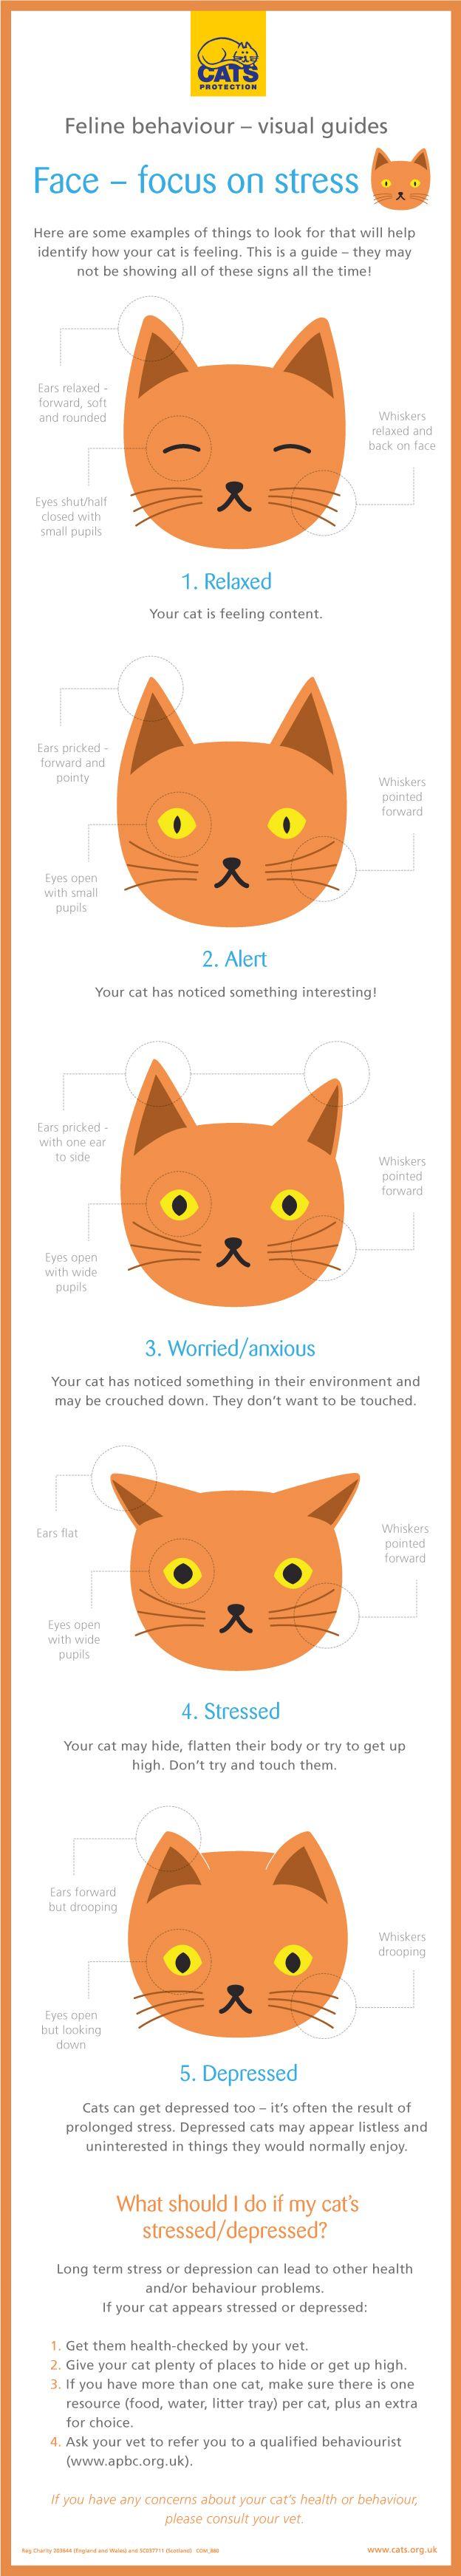 Feline behaviour explained \u2013 recognising stress in your